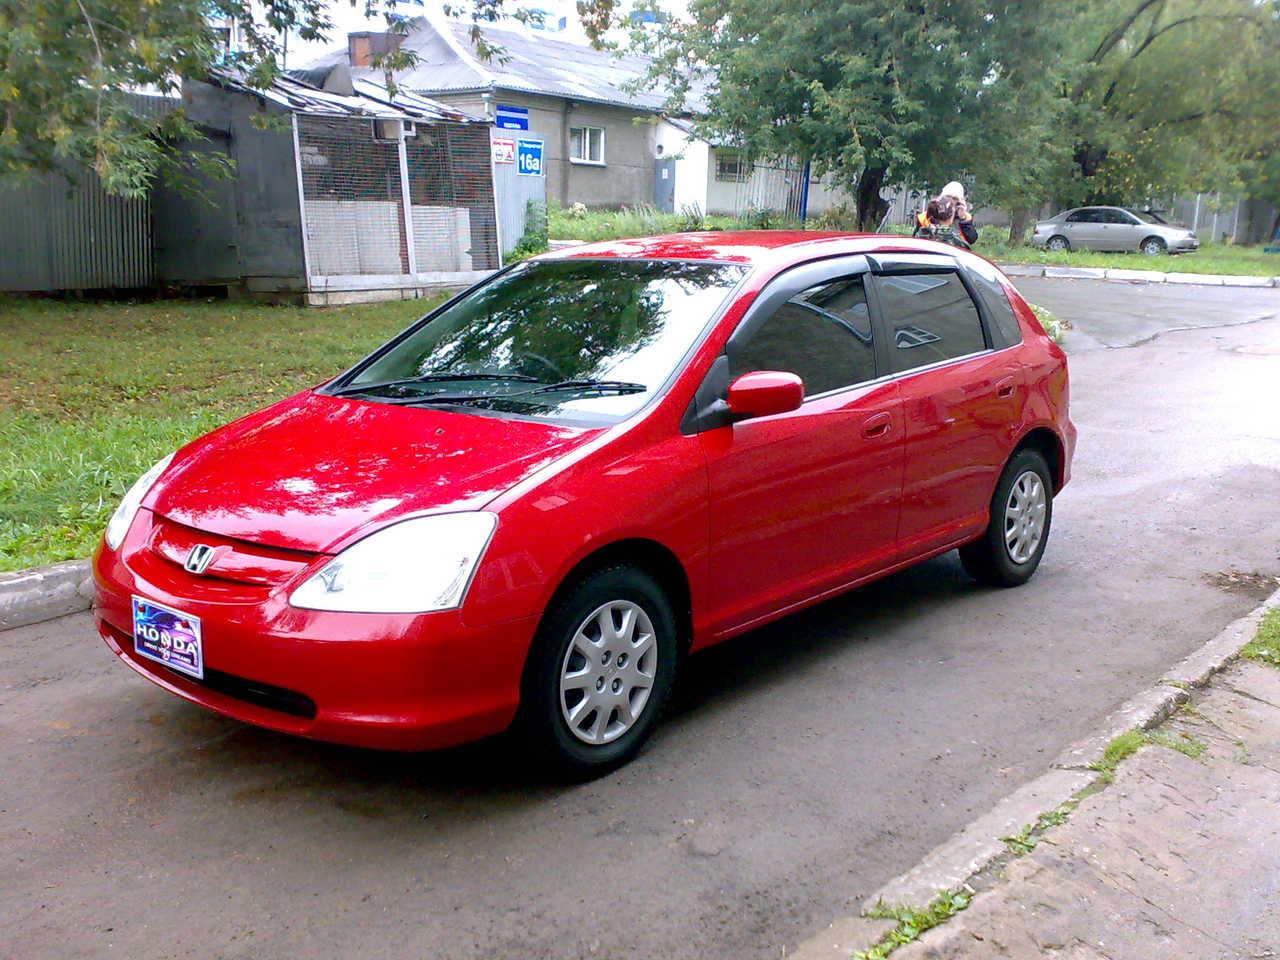 2002 honda civic pictures gasoline ff automatic for Honda limp mode